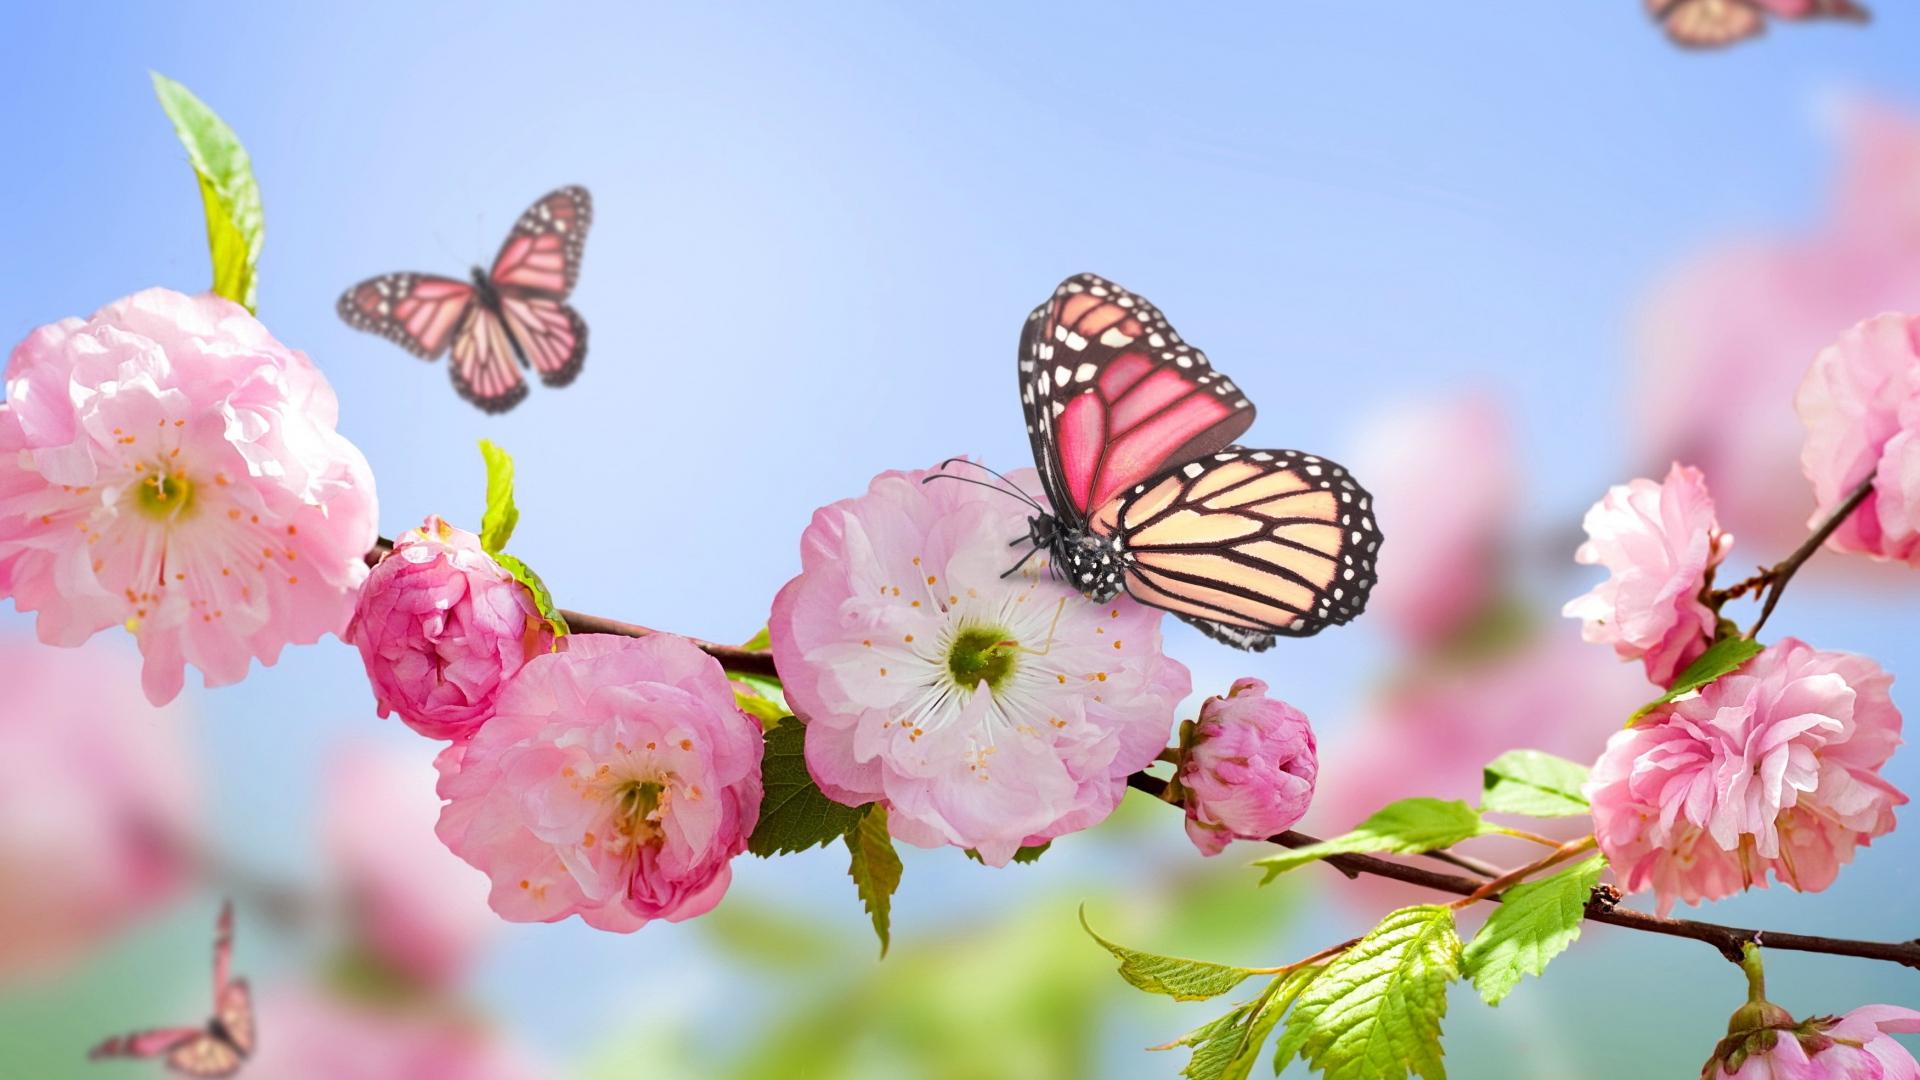 Simple Wallpaper Butterfly Spring - flowers_butterflies_spring_bloom_branch_96224_1920x1080  Photograph_265344.jpg